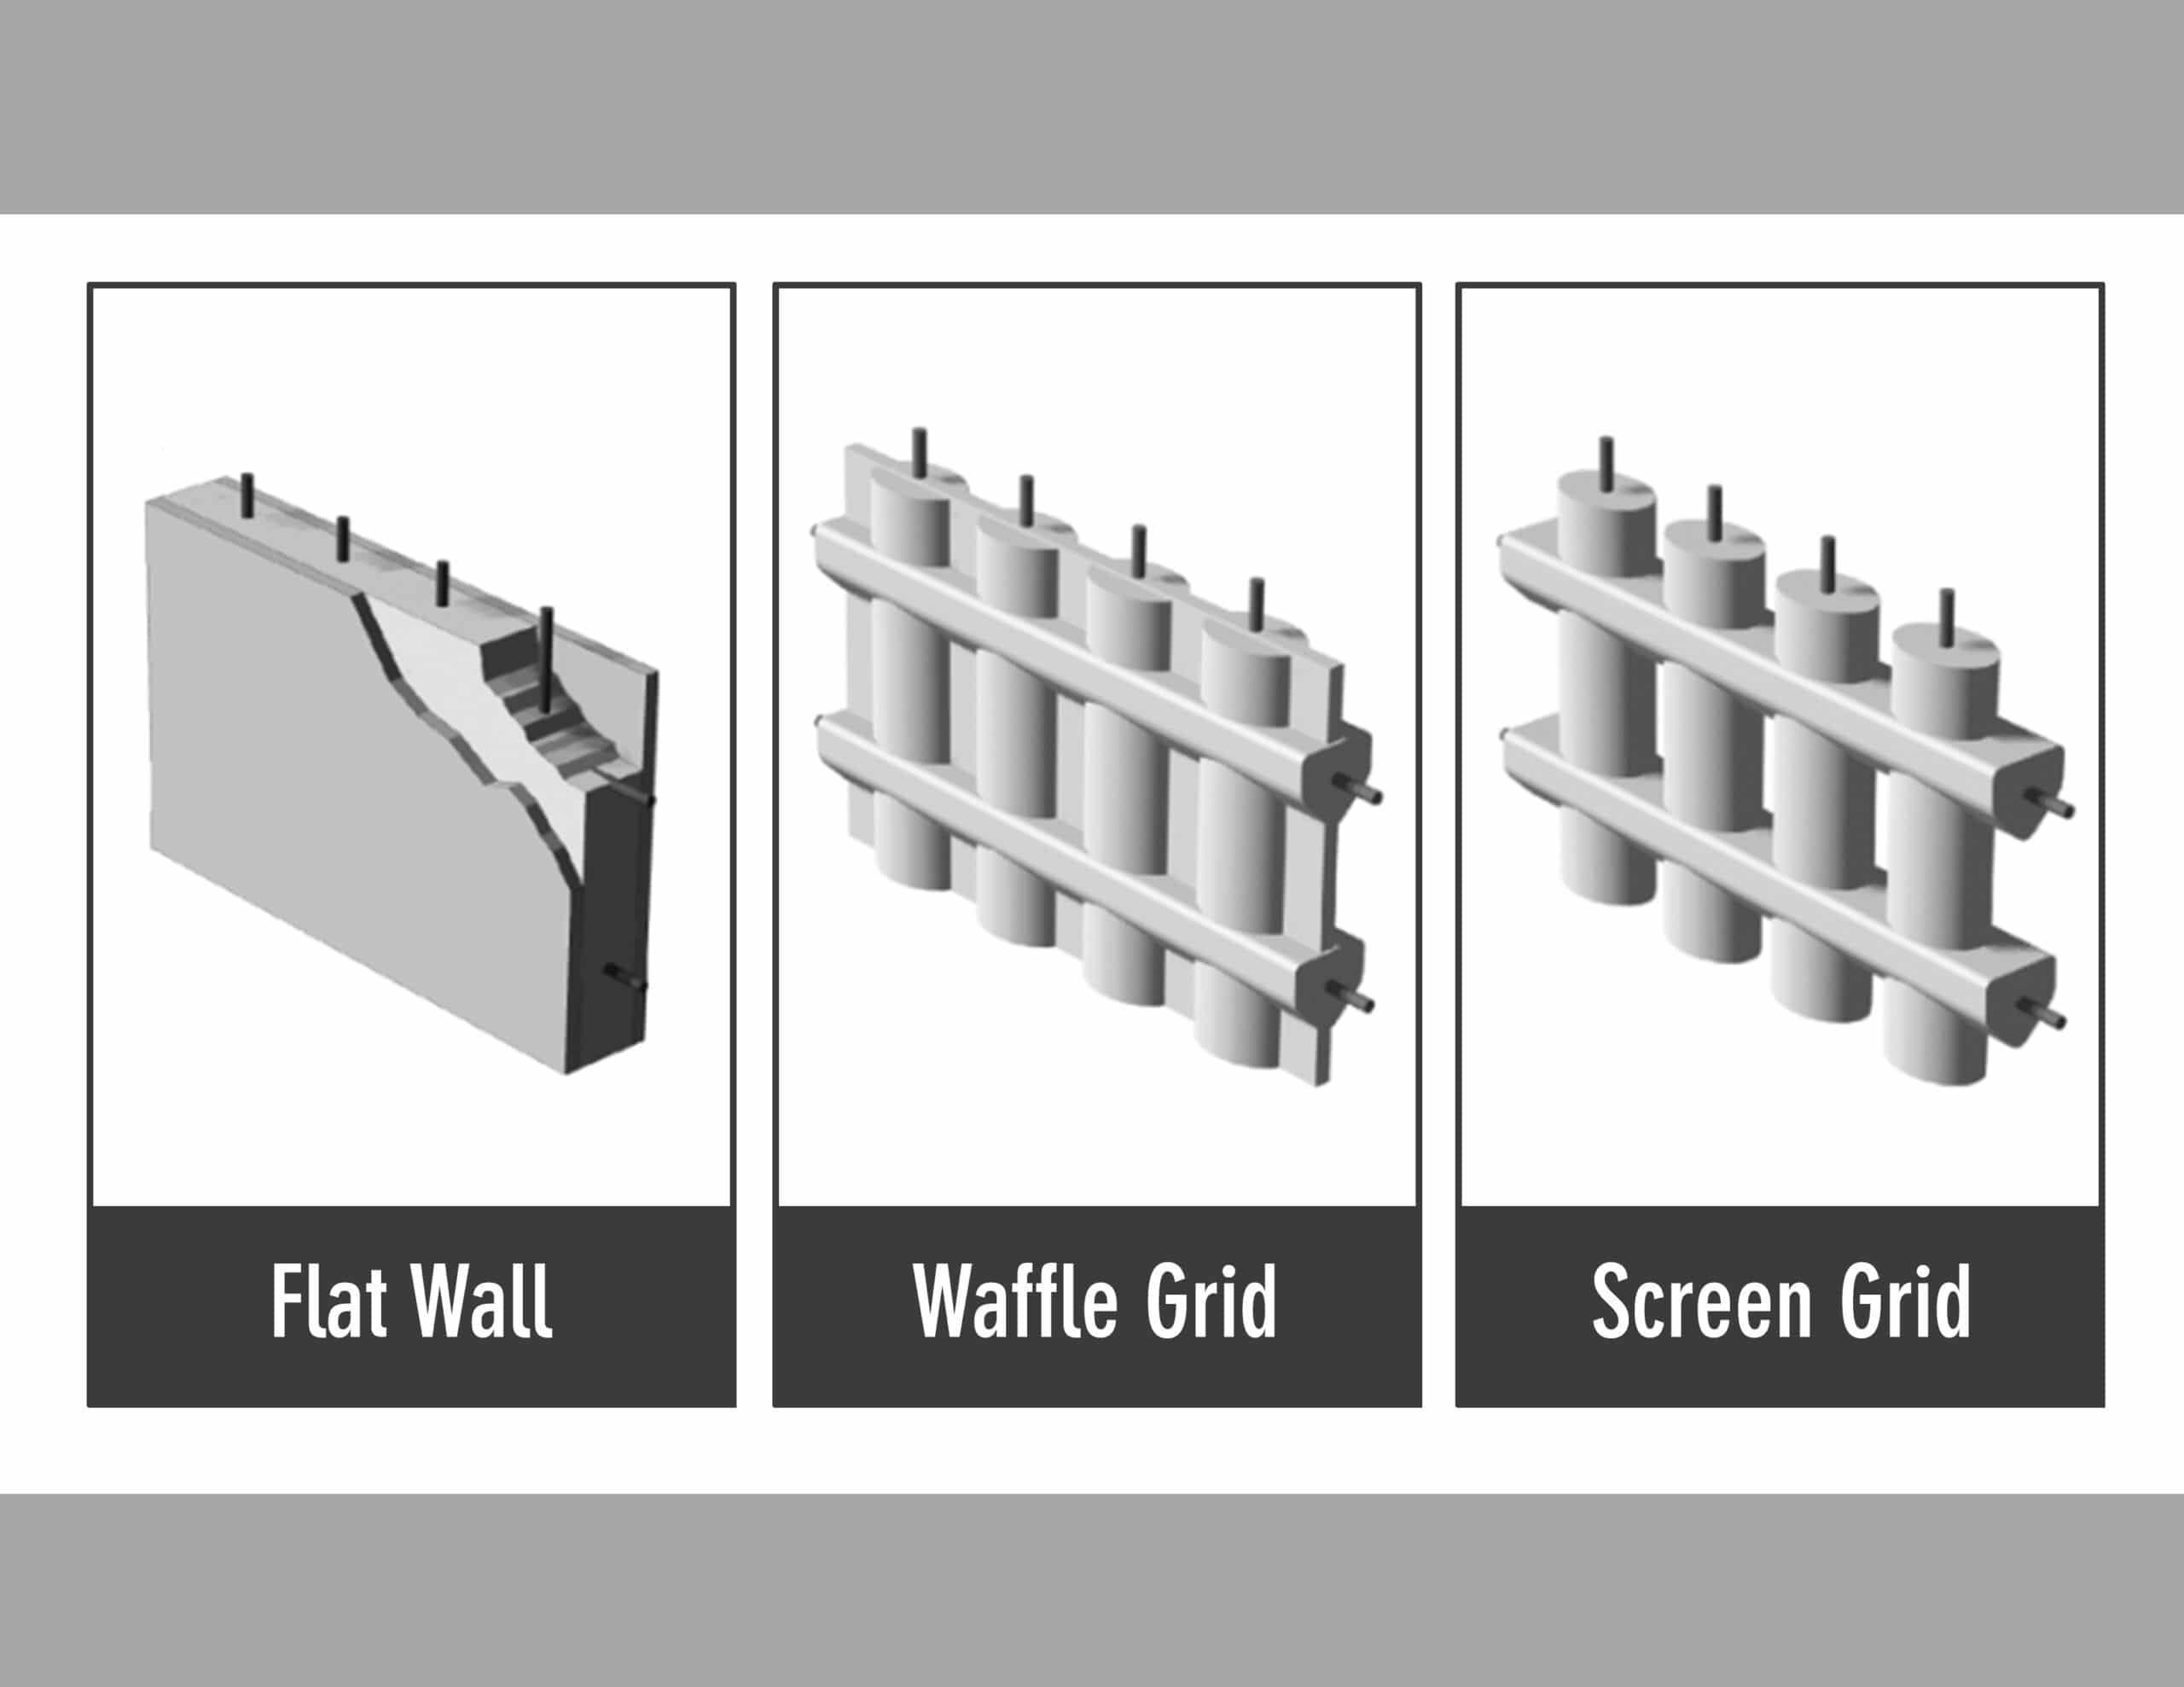 Types of ICF walls